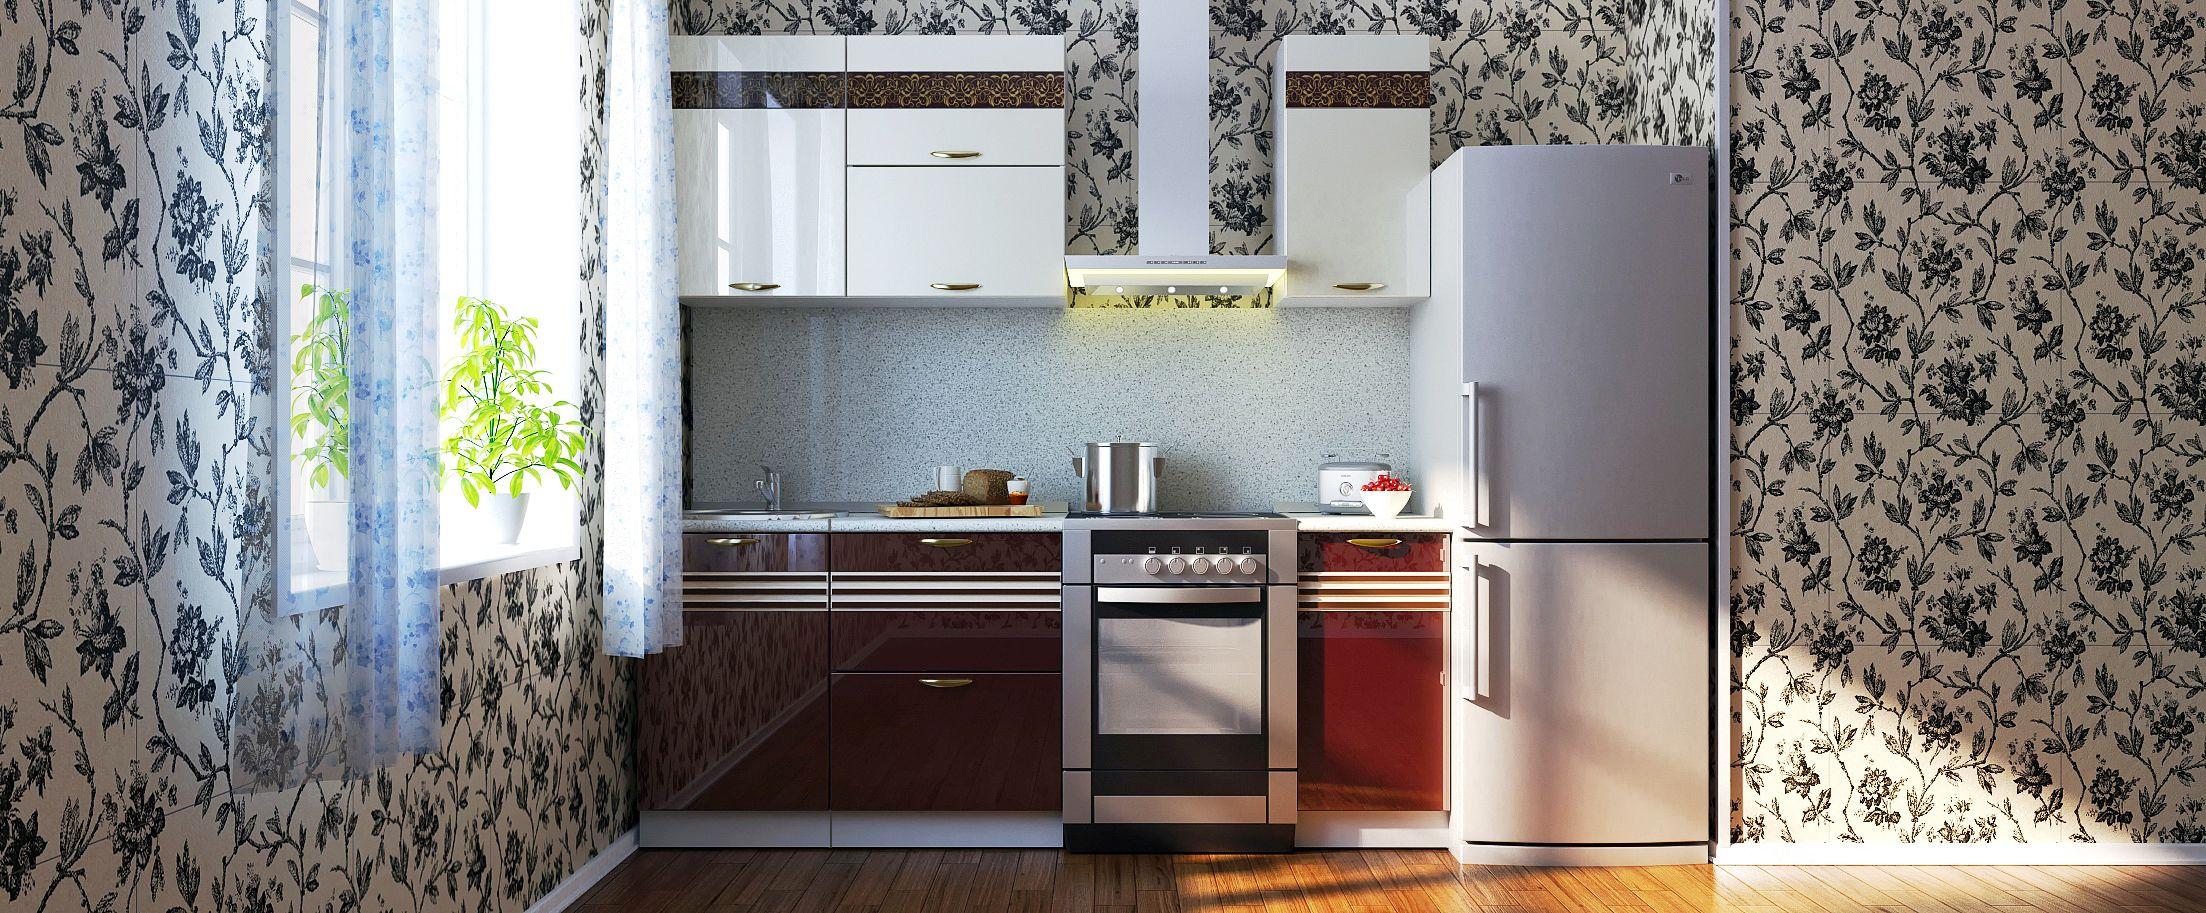 Кухня Корица 1,5 м от MOON TRADE